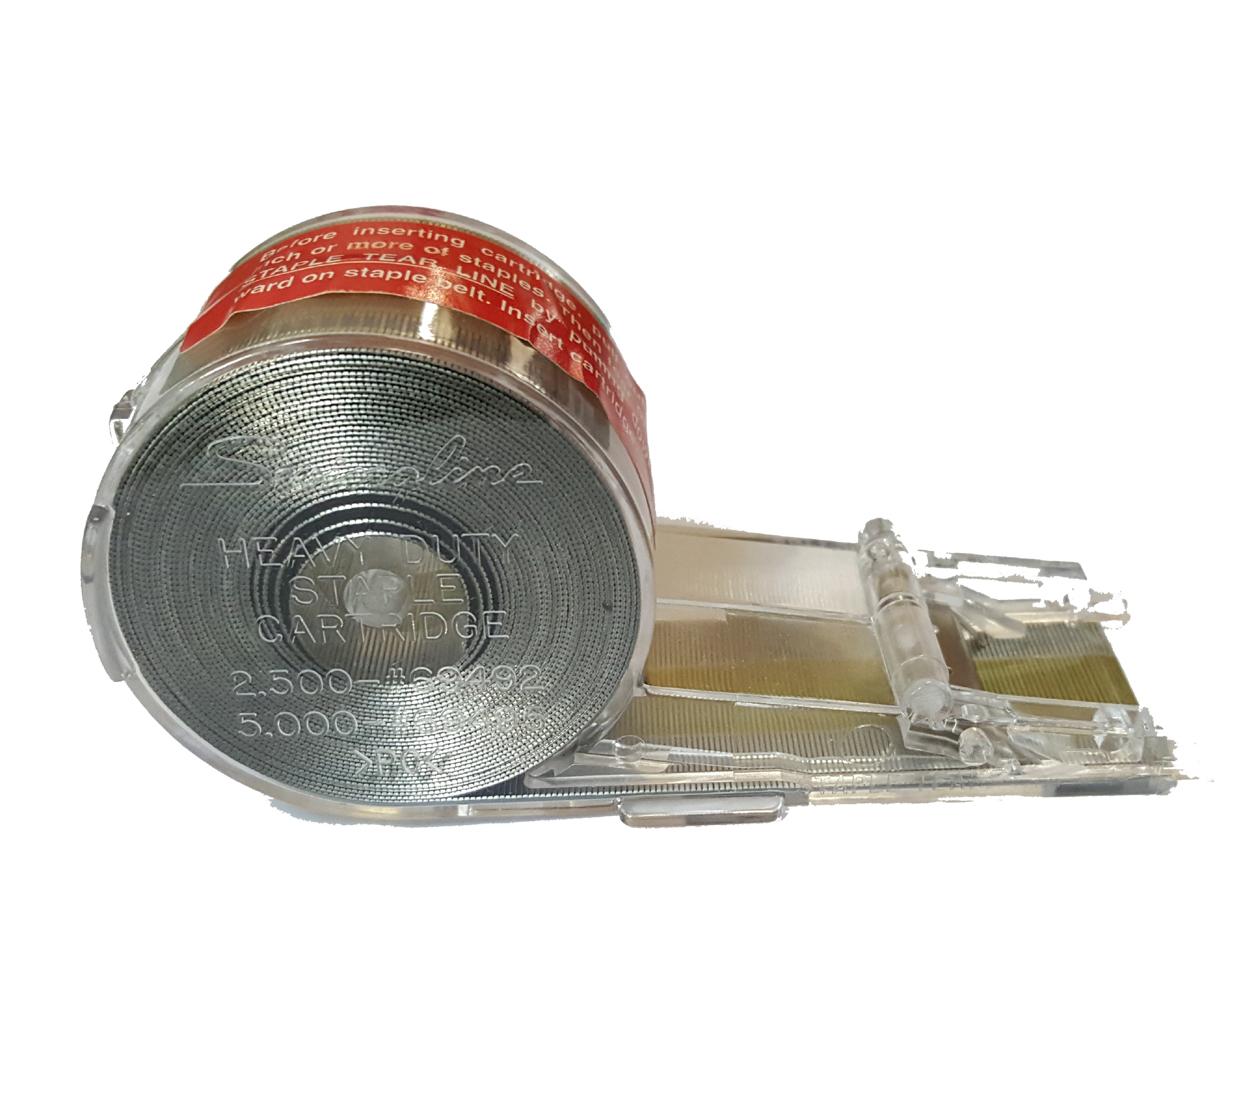 Rexel-Heftkassette-f-r-Stella-70-06311-5000